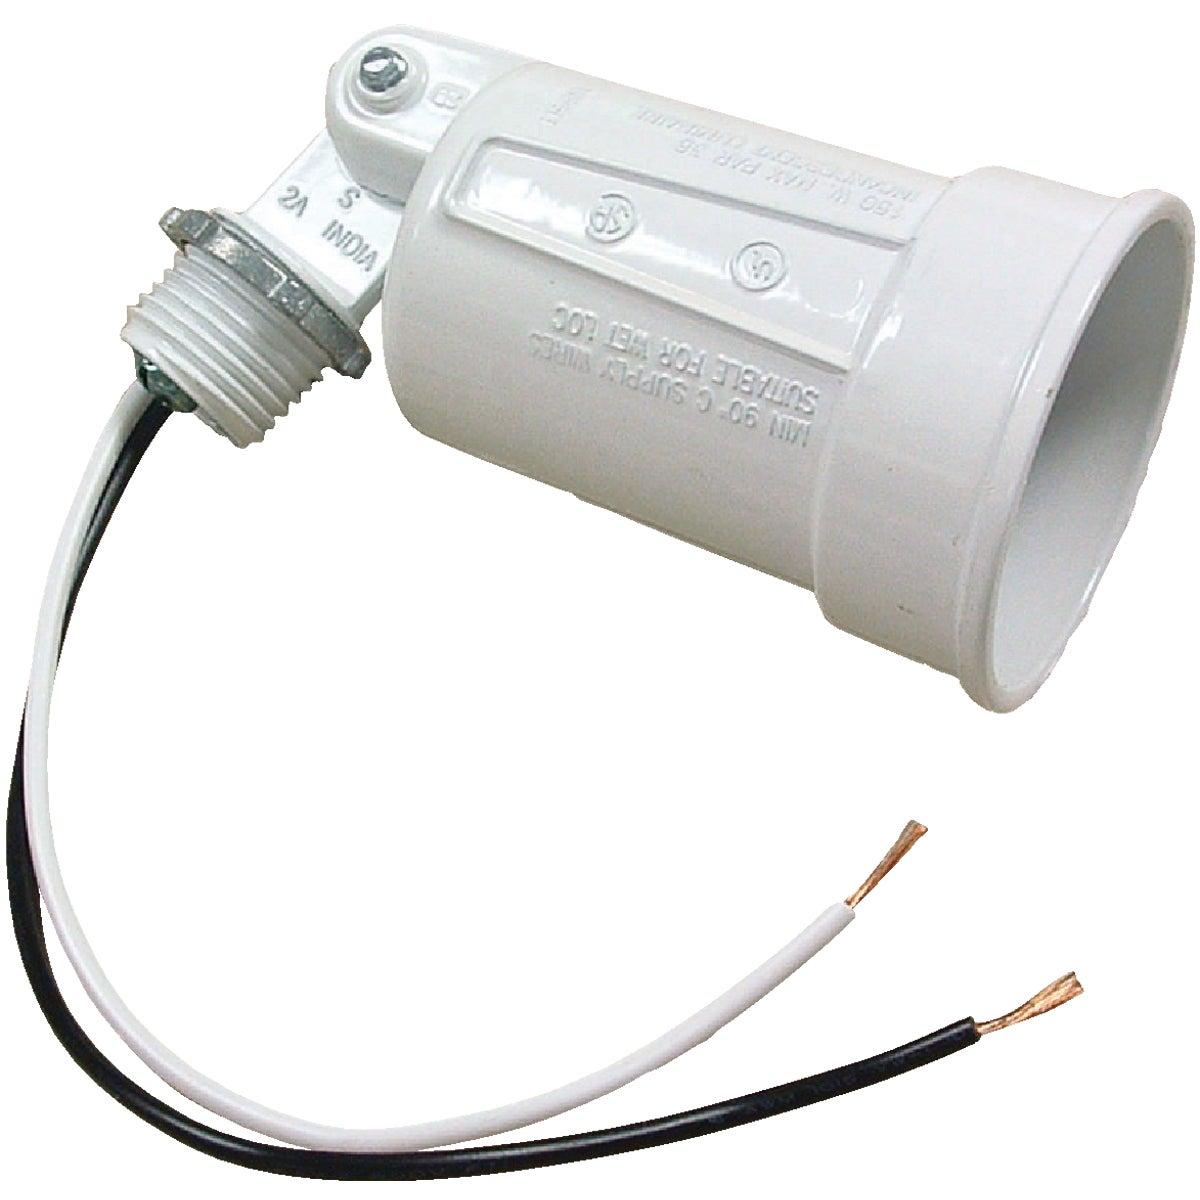 Bell 150W PAR38 White Single Bulb Weatherproof Outdoor Lampholder, Carded